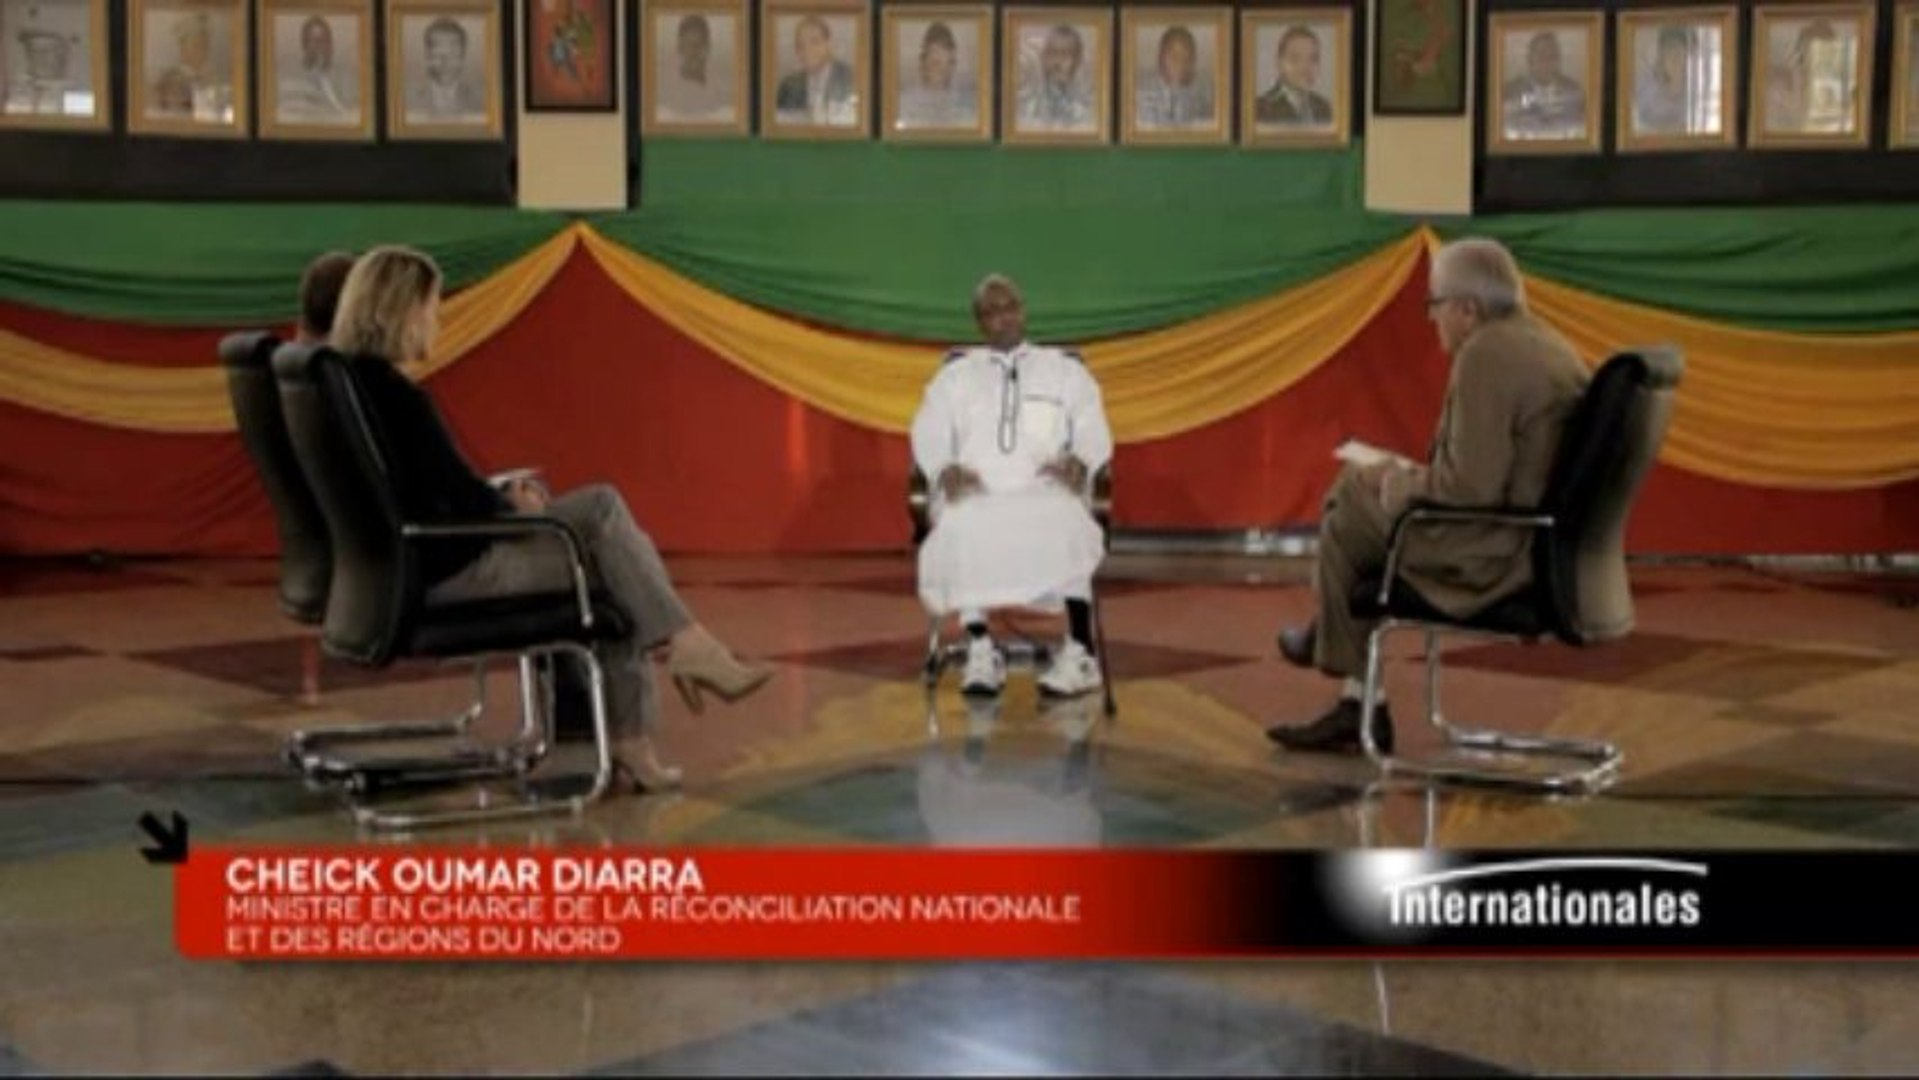 Internationales - Cheickh Oumar Diarrah - 10/11/2013